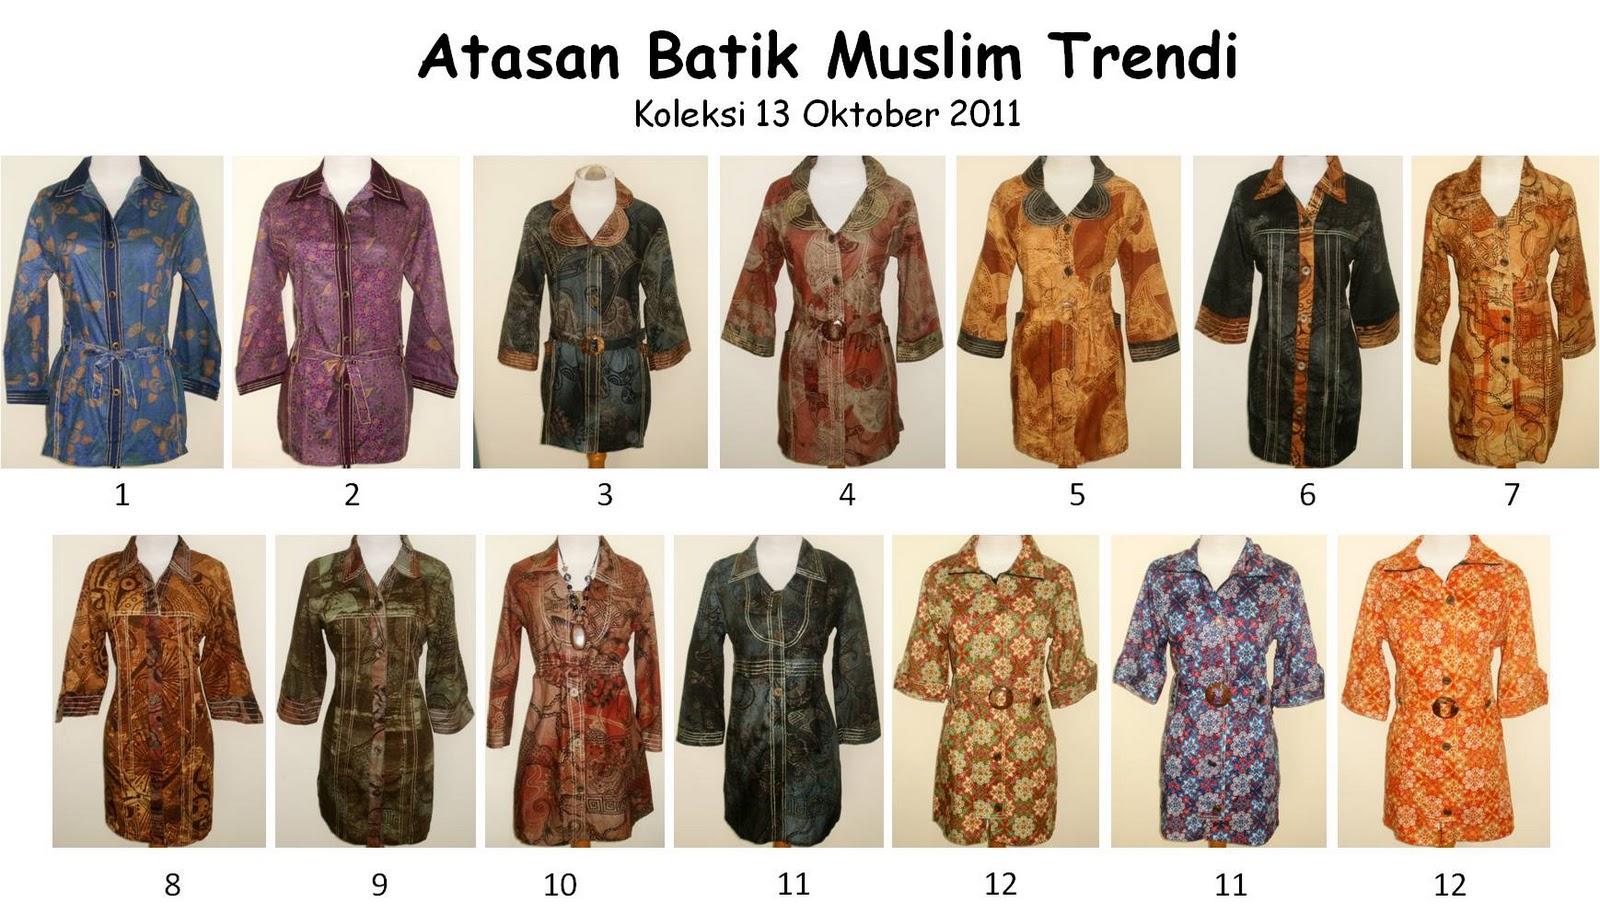 Atasan Batik Muslim Trendi, www balibaju com atasan batik muslim